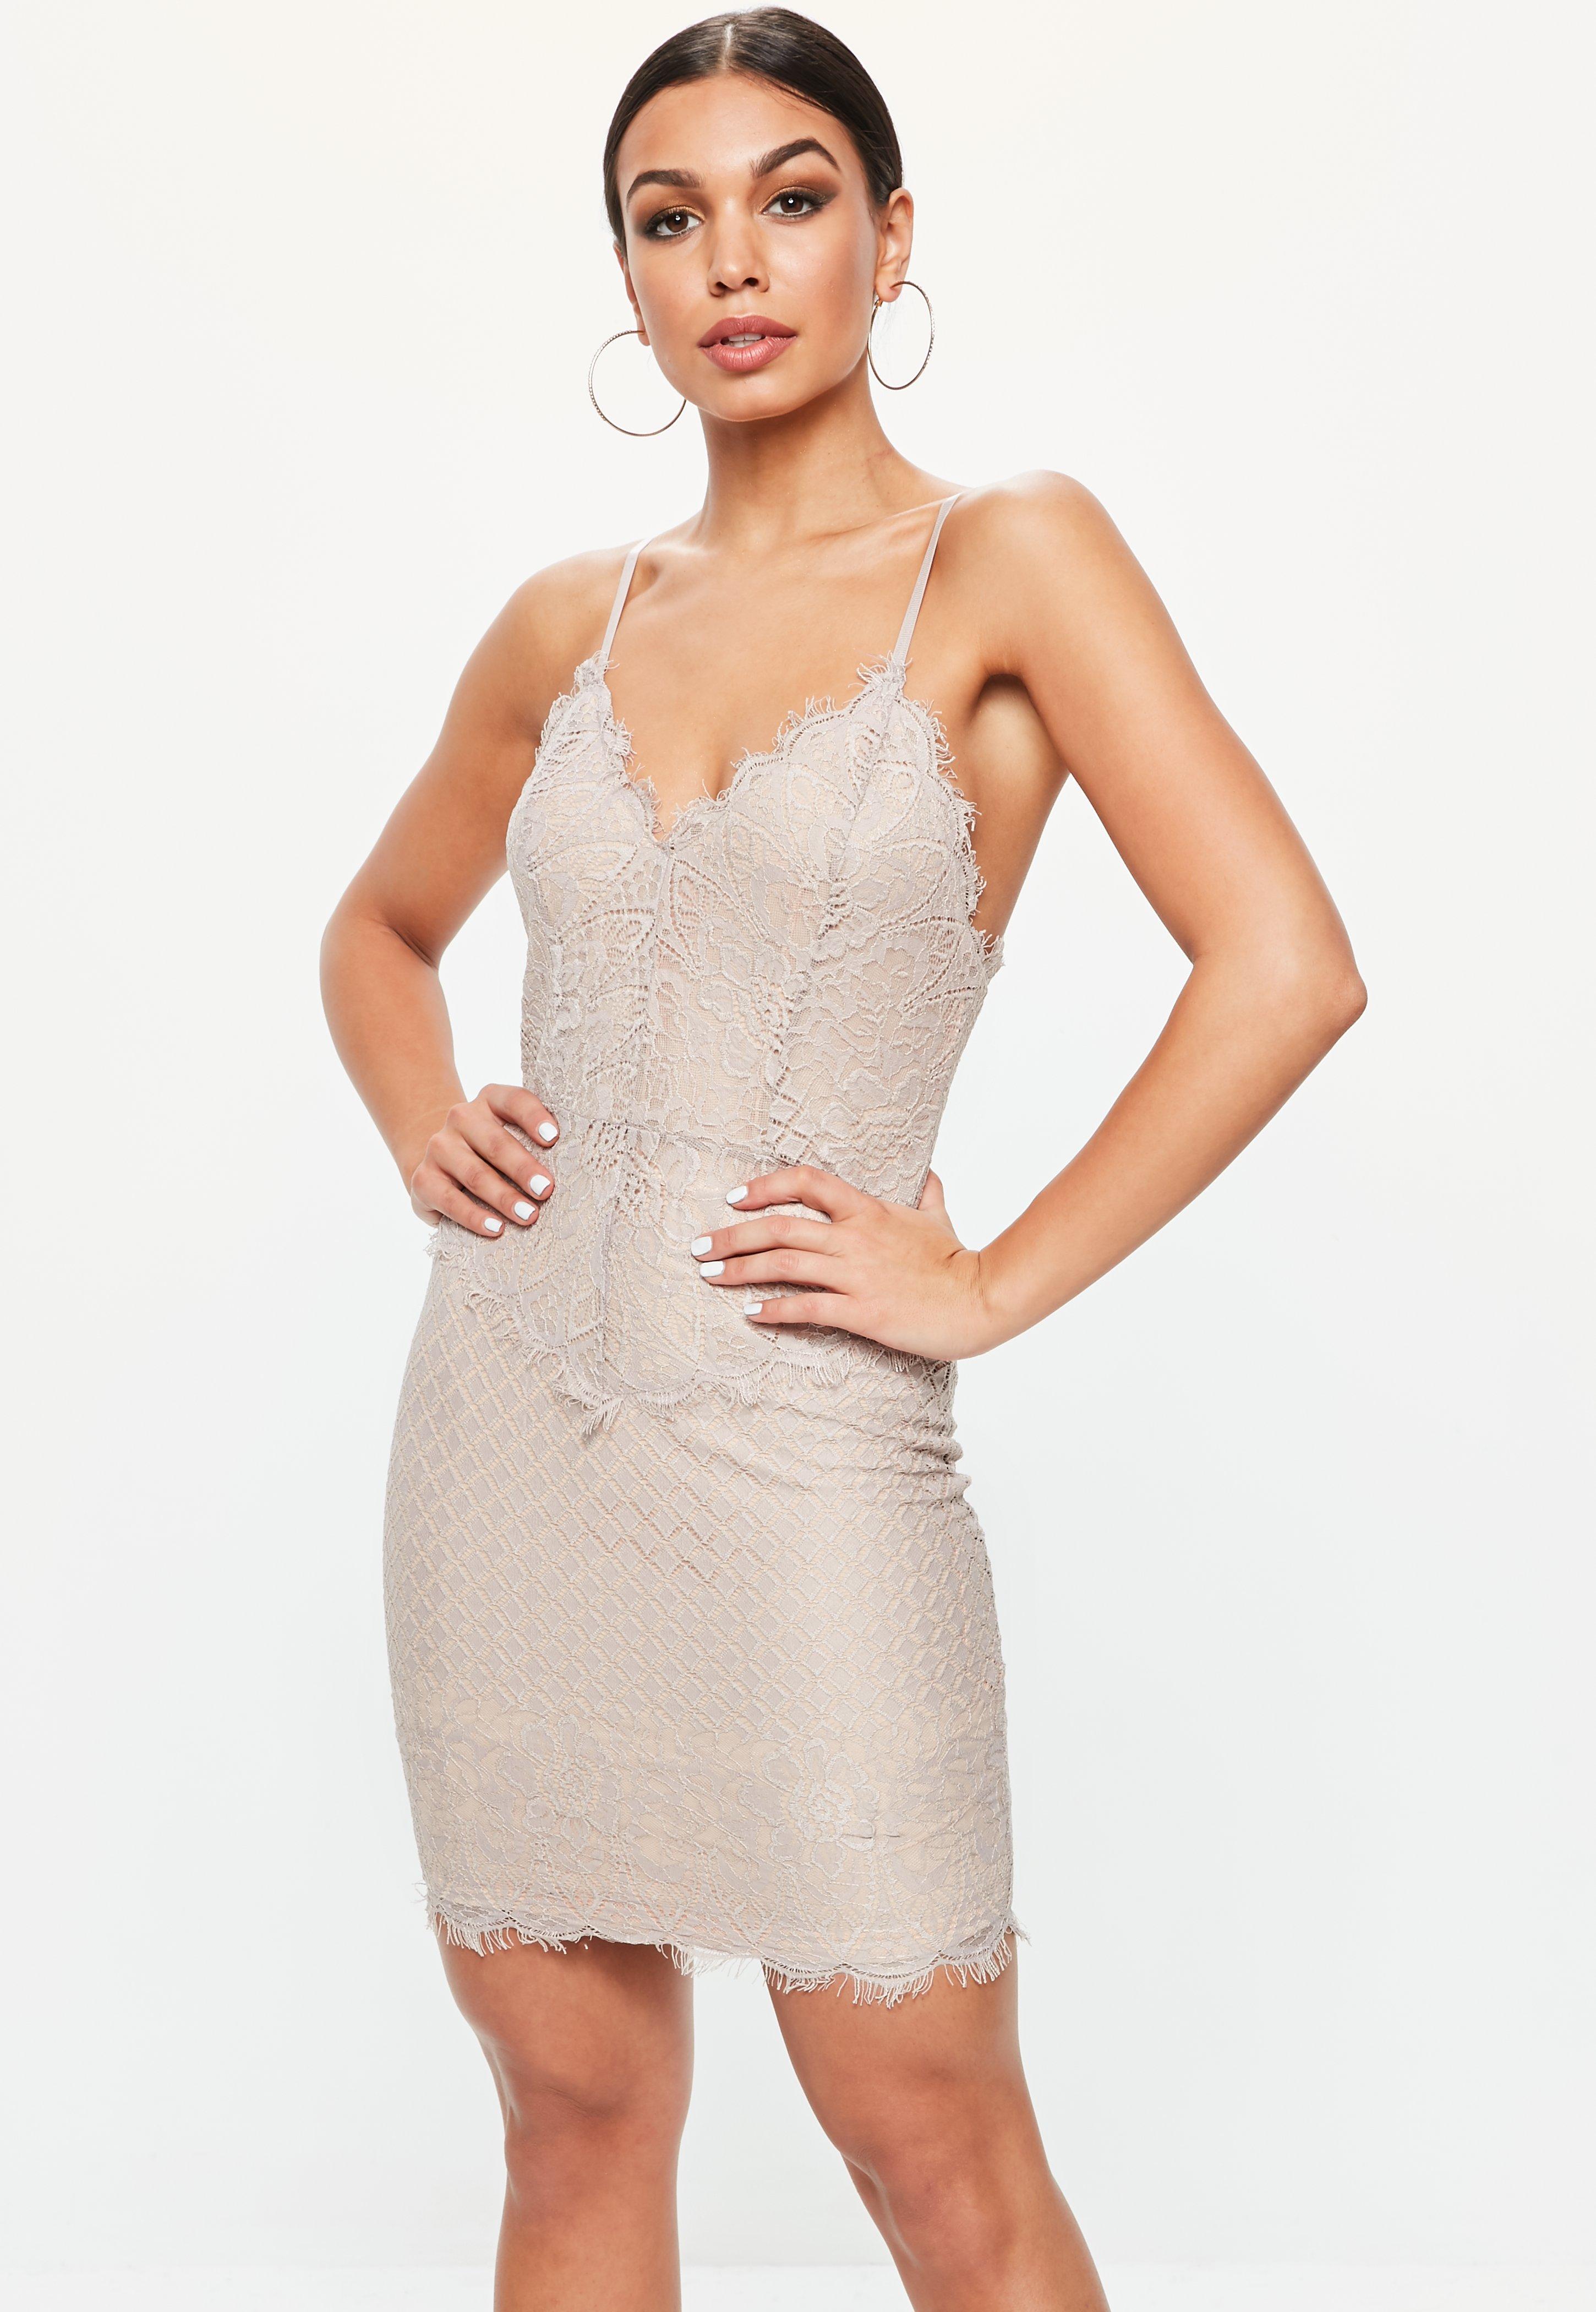 Cocktail Dresses | Elegant & Black Tie Dresses - Missguided